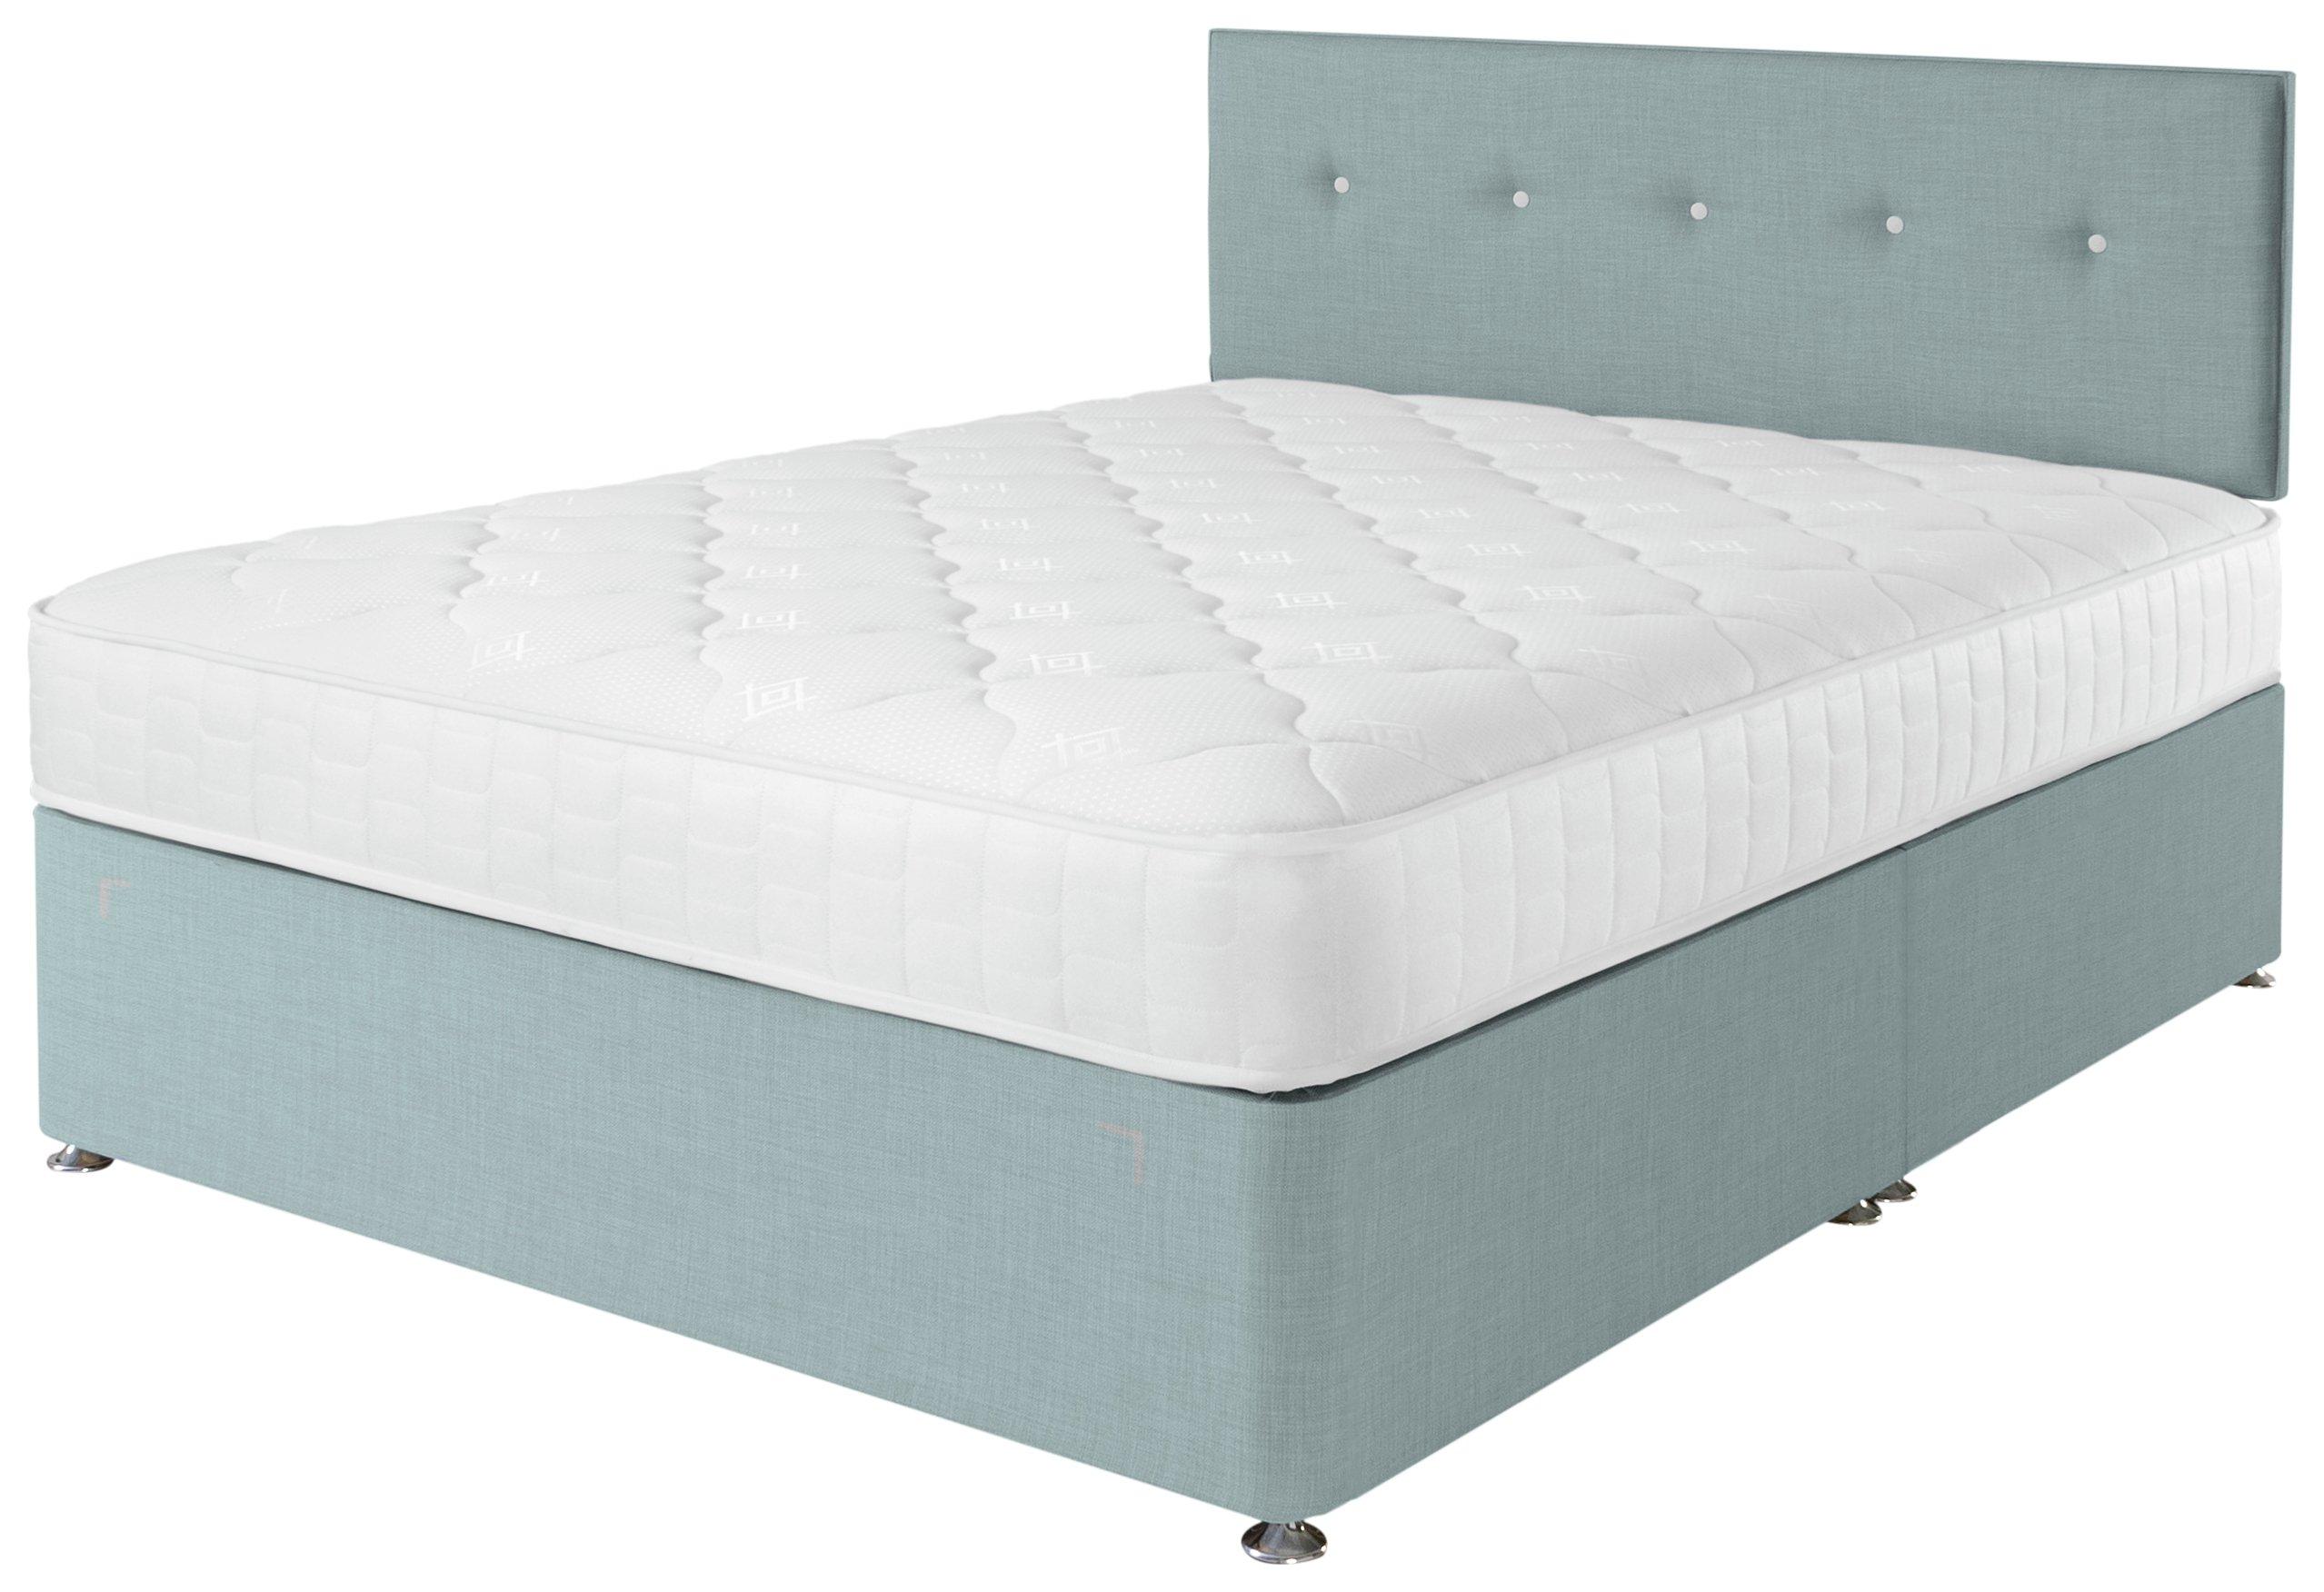 Airsprung Dalham Memory Blue Divan Bed - Double